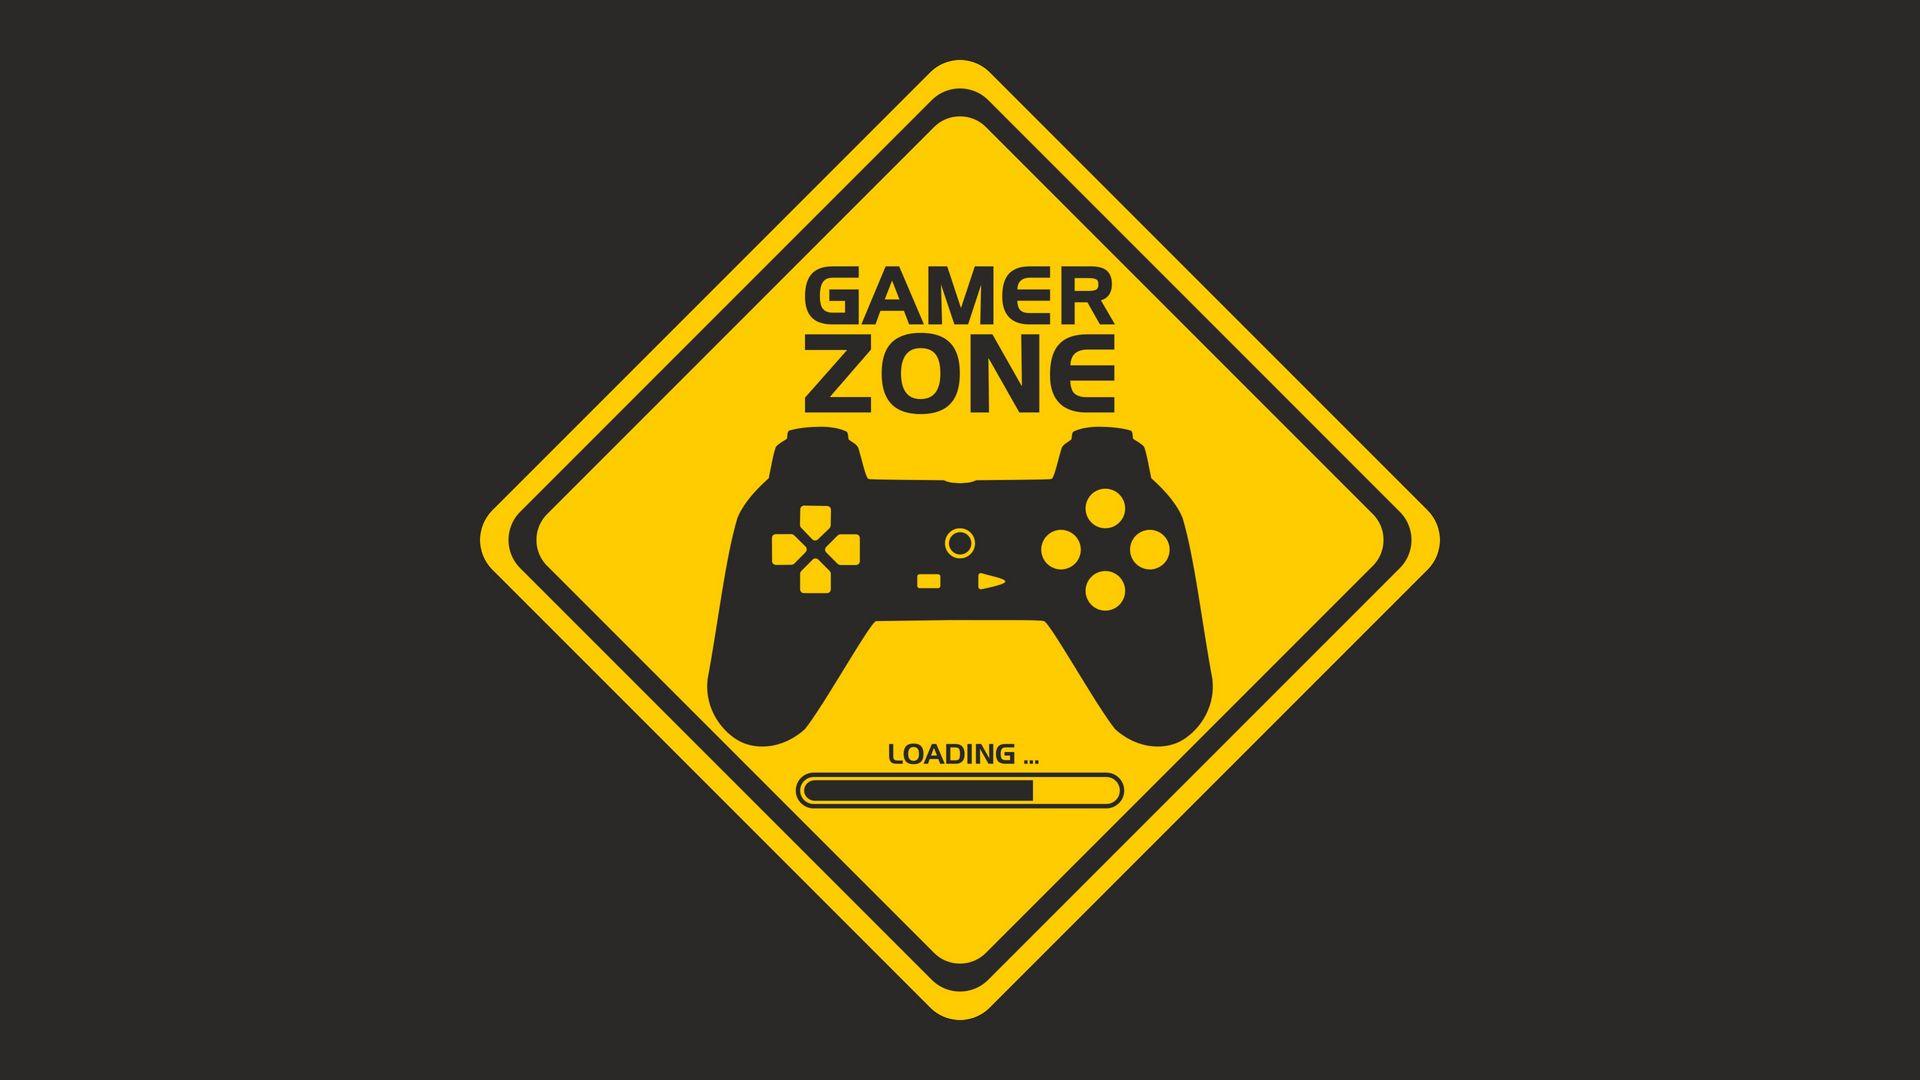 1920x1080 Wallpaper joystick, controller, gamer zone, player